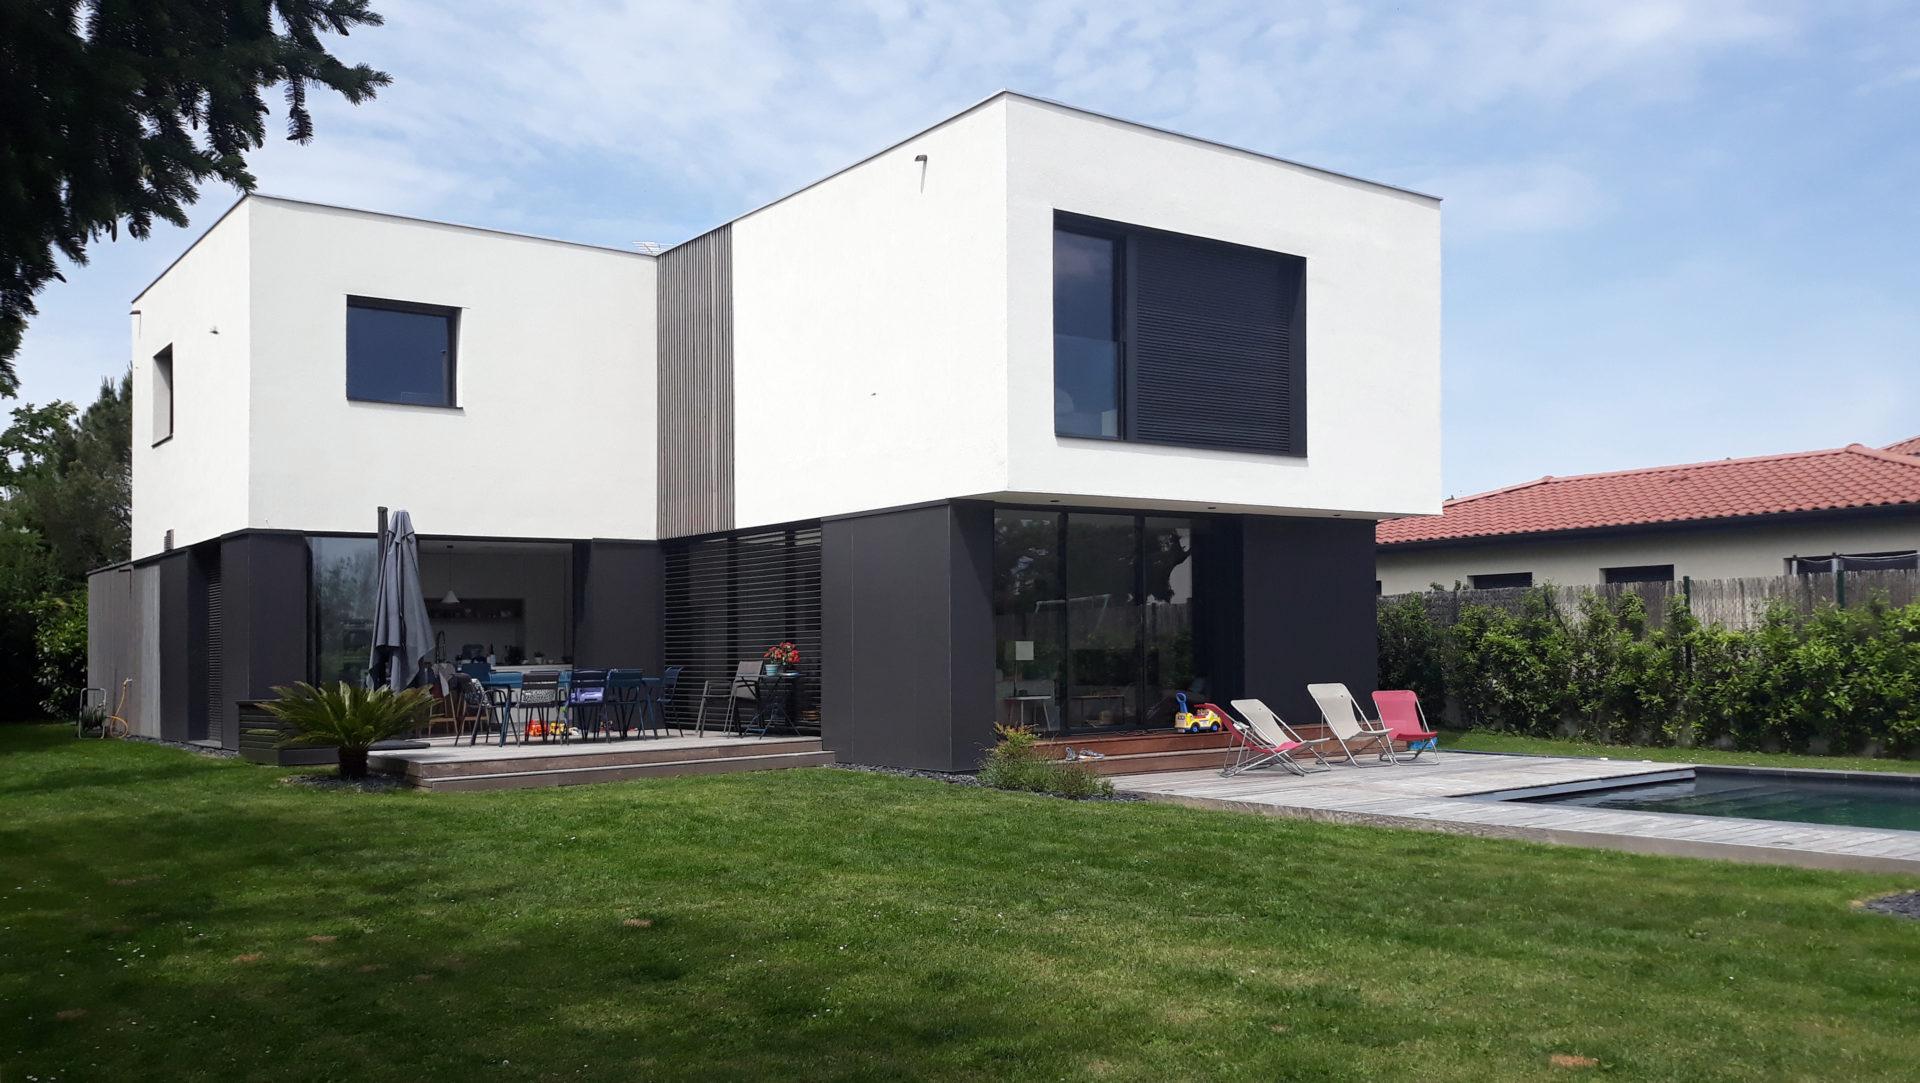 asb-architecture-maison-contemporaine-toiture-terrasse-minimaliste 2